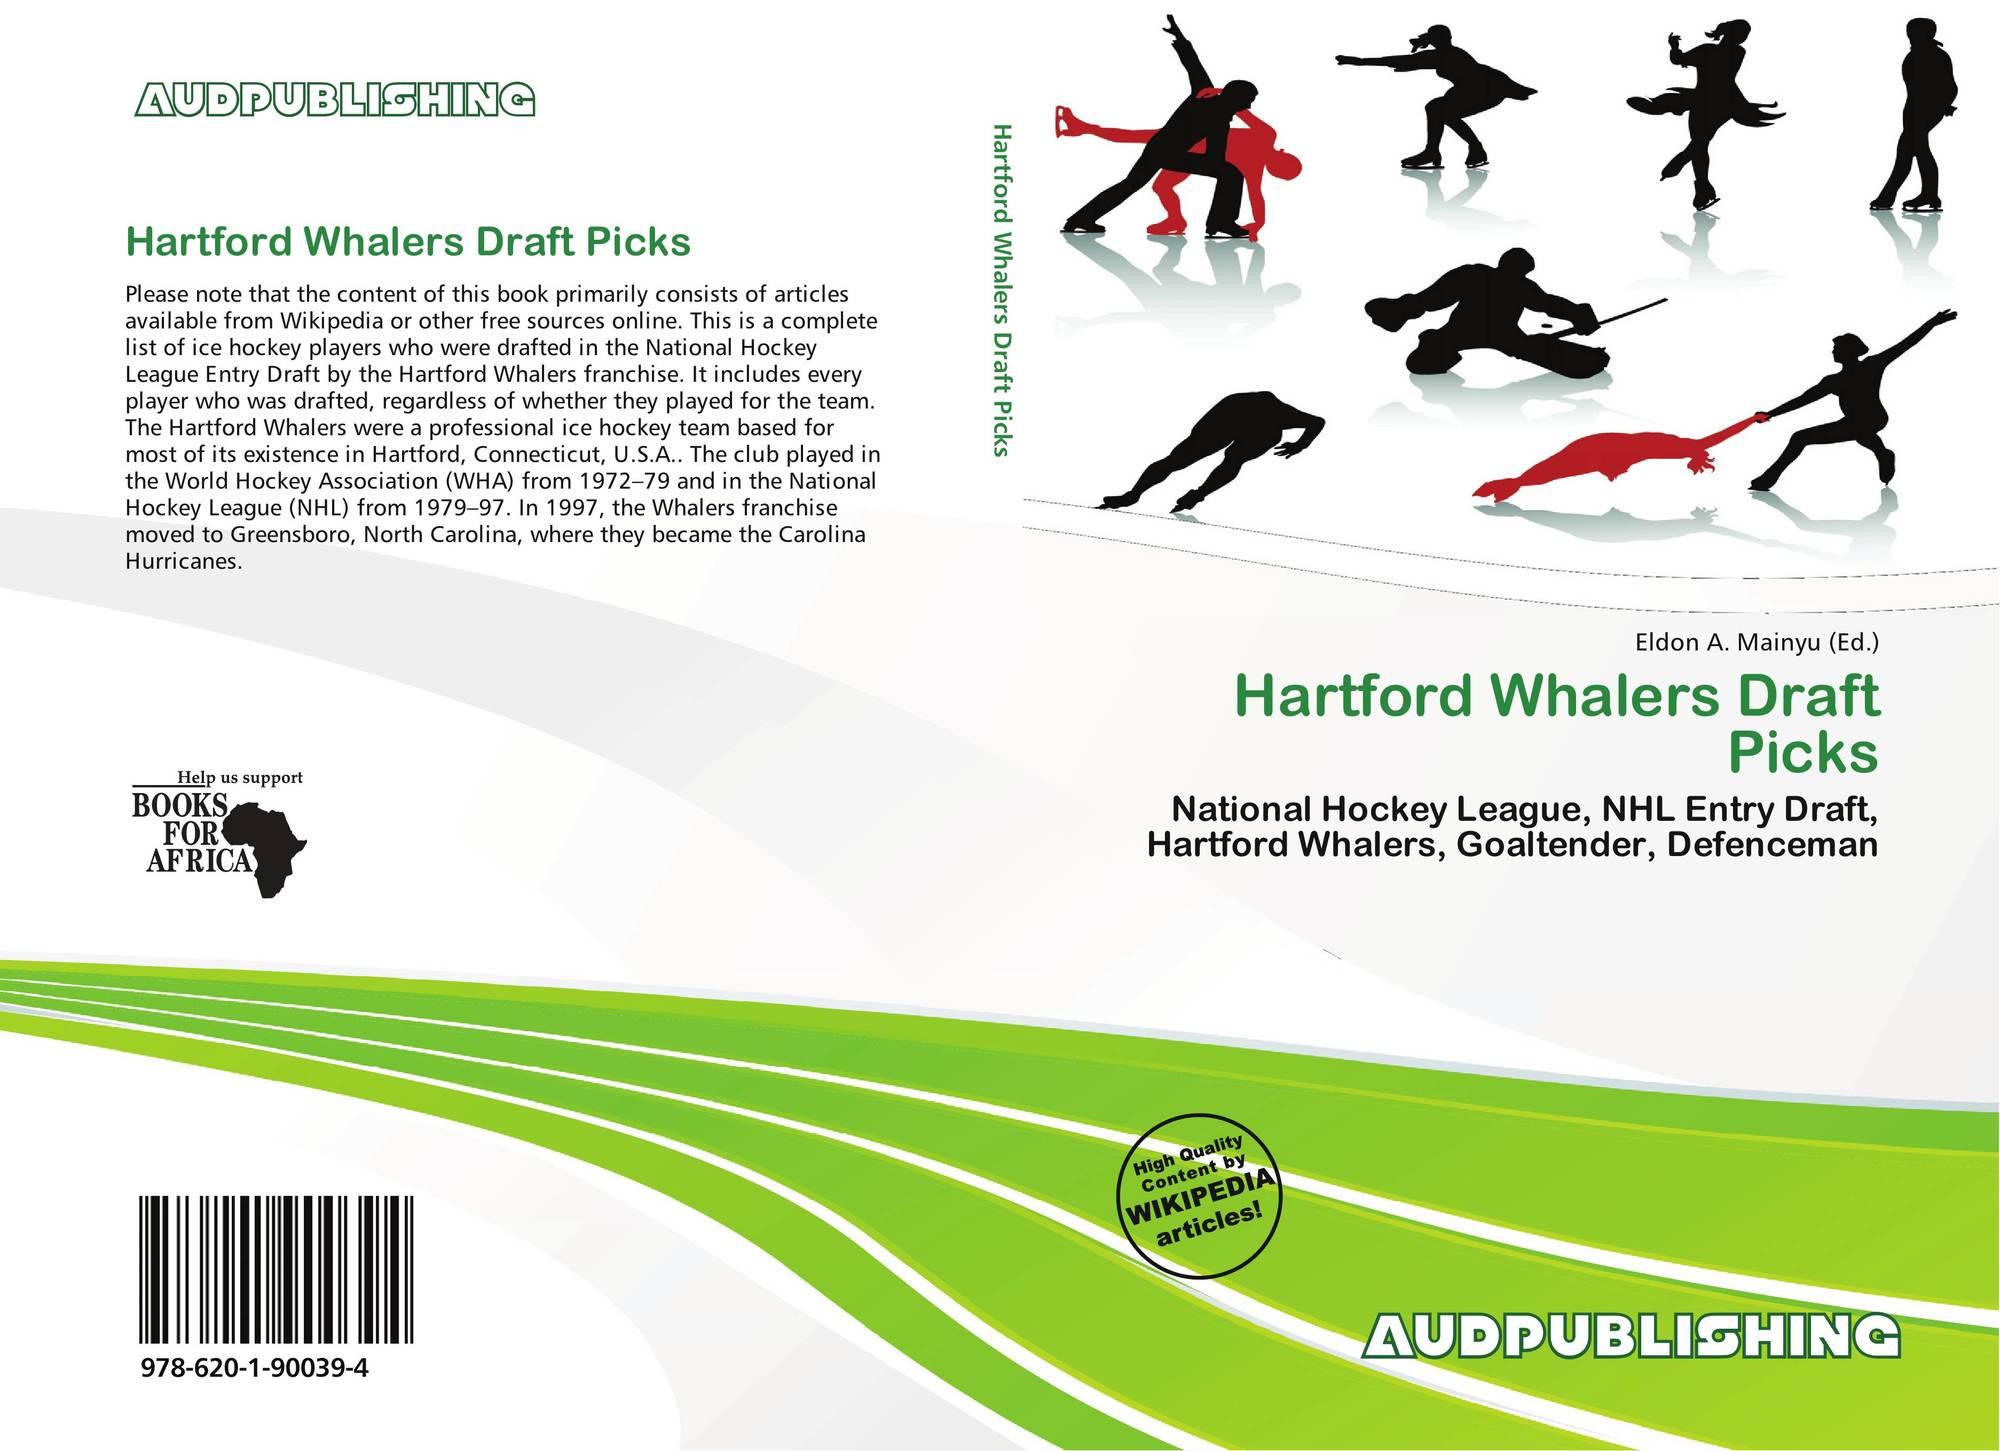 Bookcover of Hartford Whalers Draft Picks. Omni badge  9307e2201e5f762643a64561af3456be64a87707602f96b92ef18a9bbcada116 918a741c0